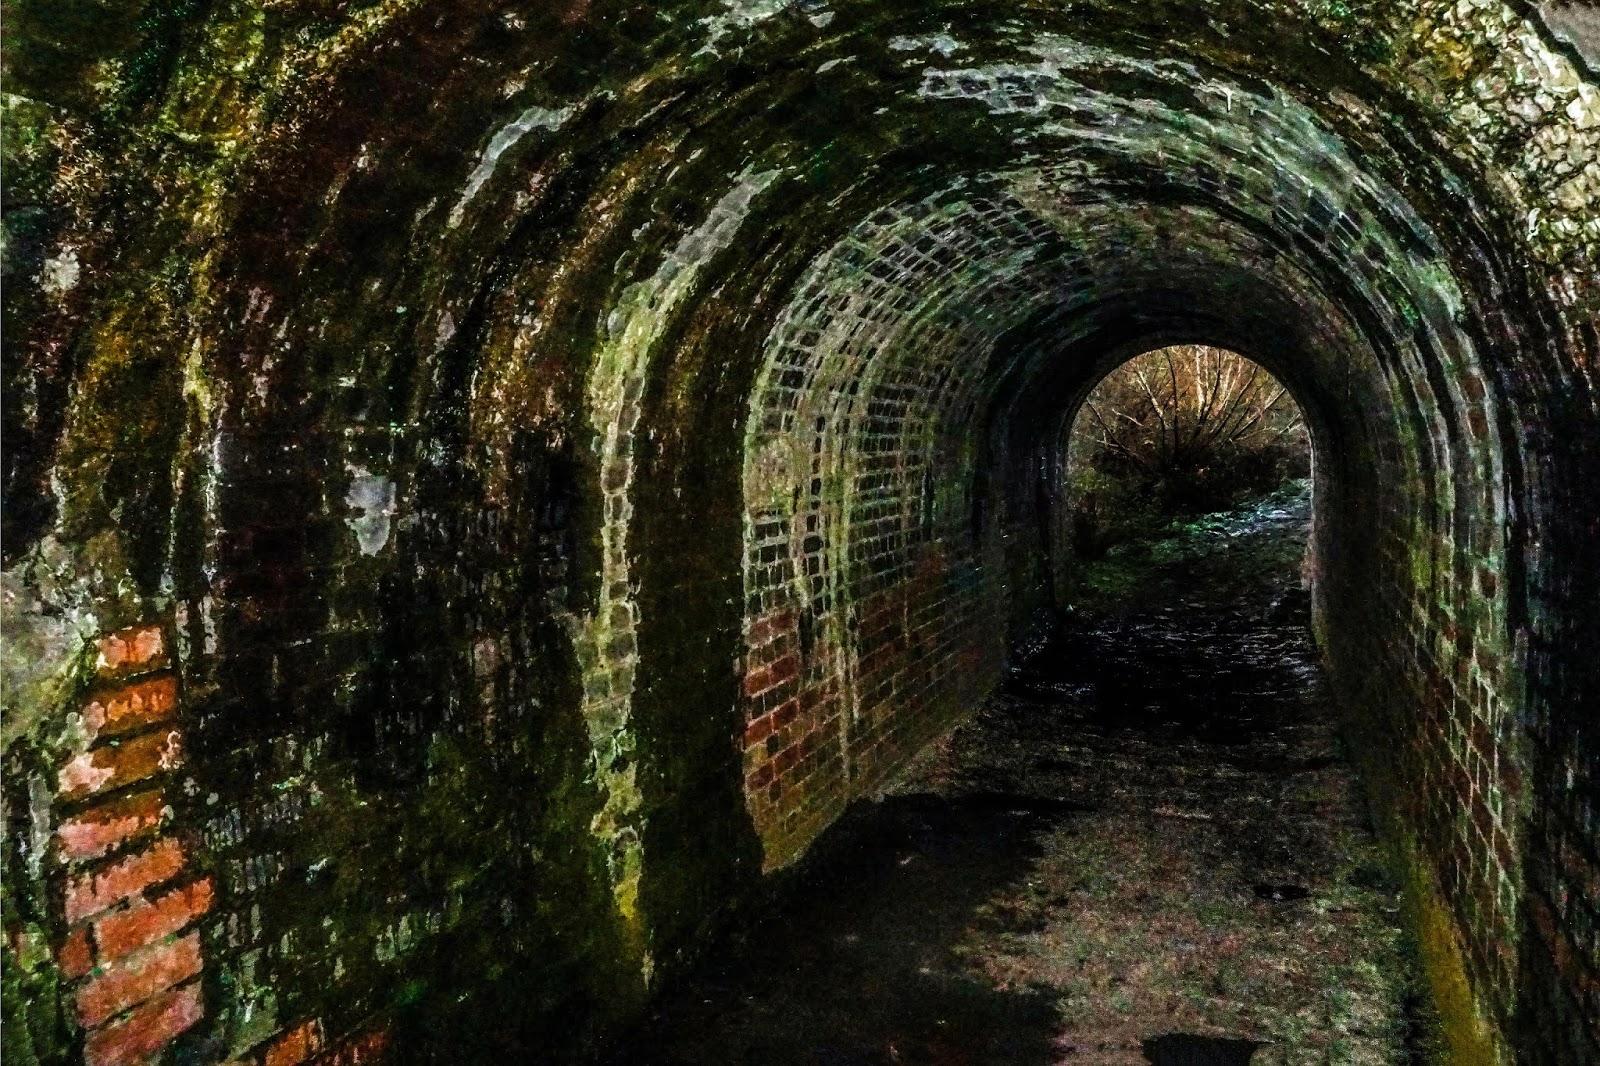 Fort Santiago, Intramuros Tunnel